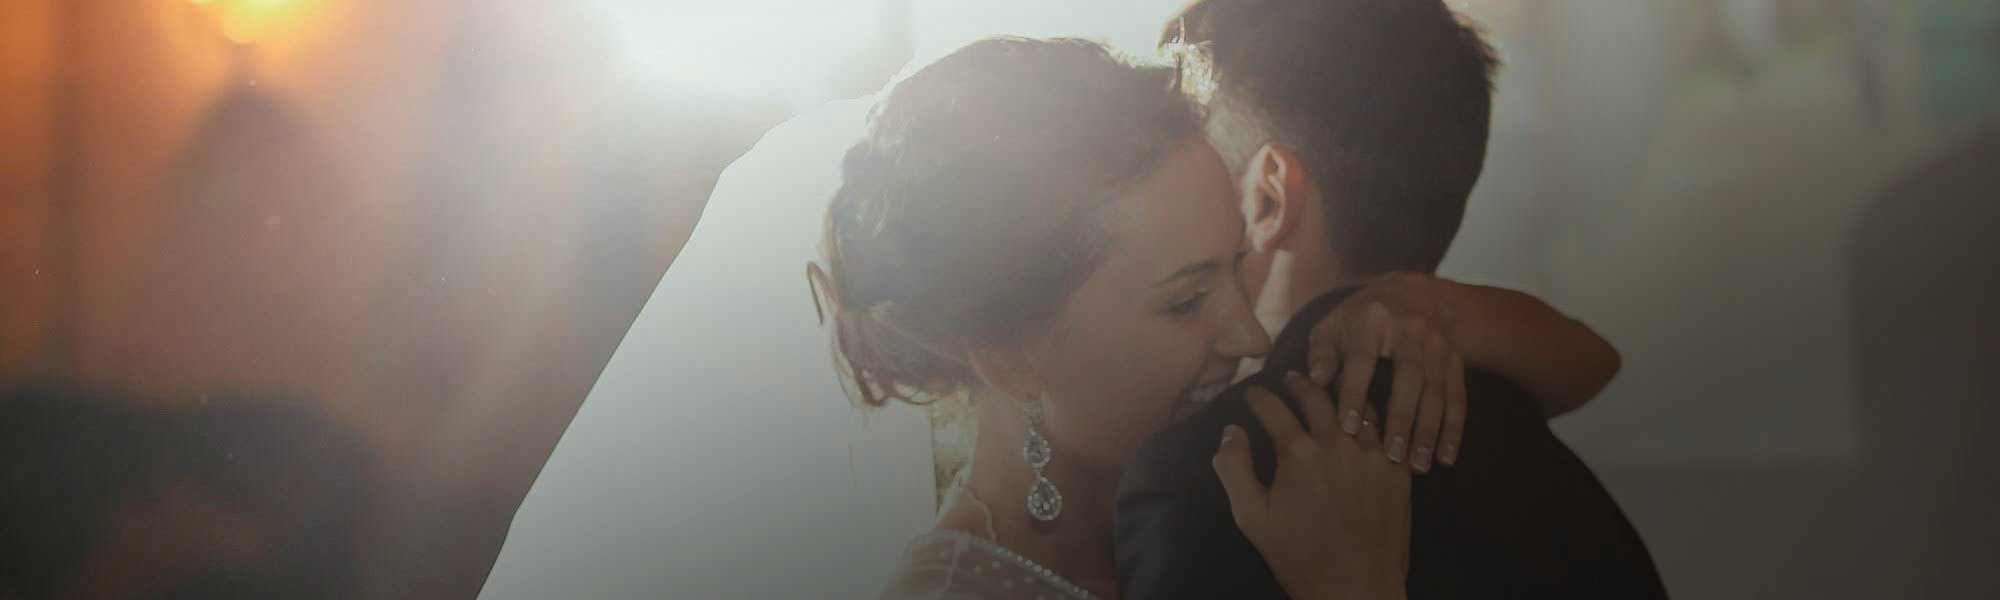 <strong>Hochzeitsbands direkt</strong> - sofort Bands, Preise & Angebote!